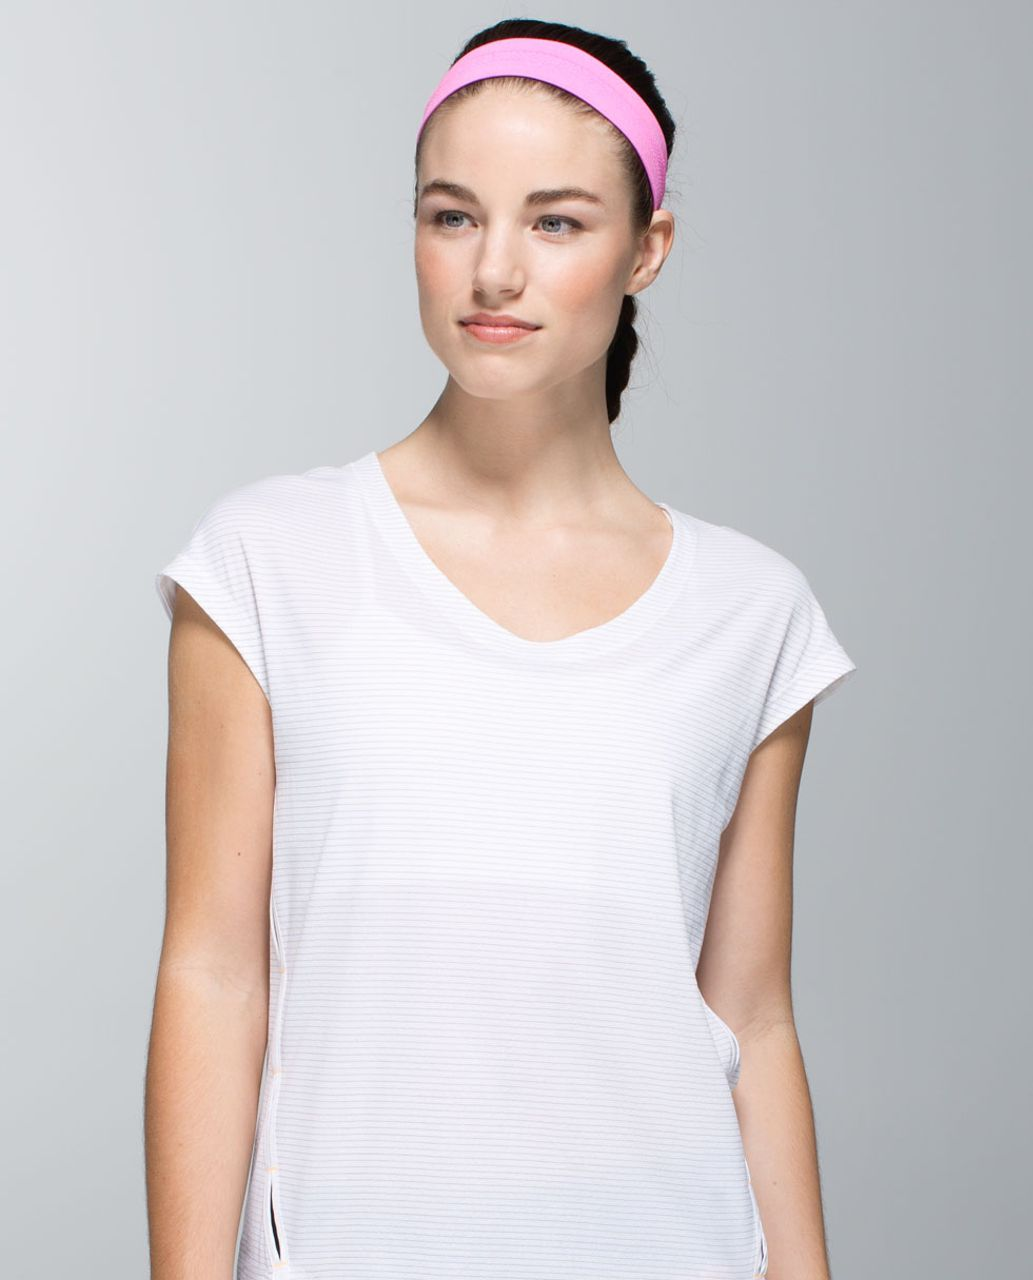 Lululemon Swiftly Headband - Heathered Pow Pink Light